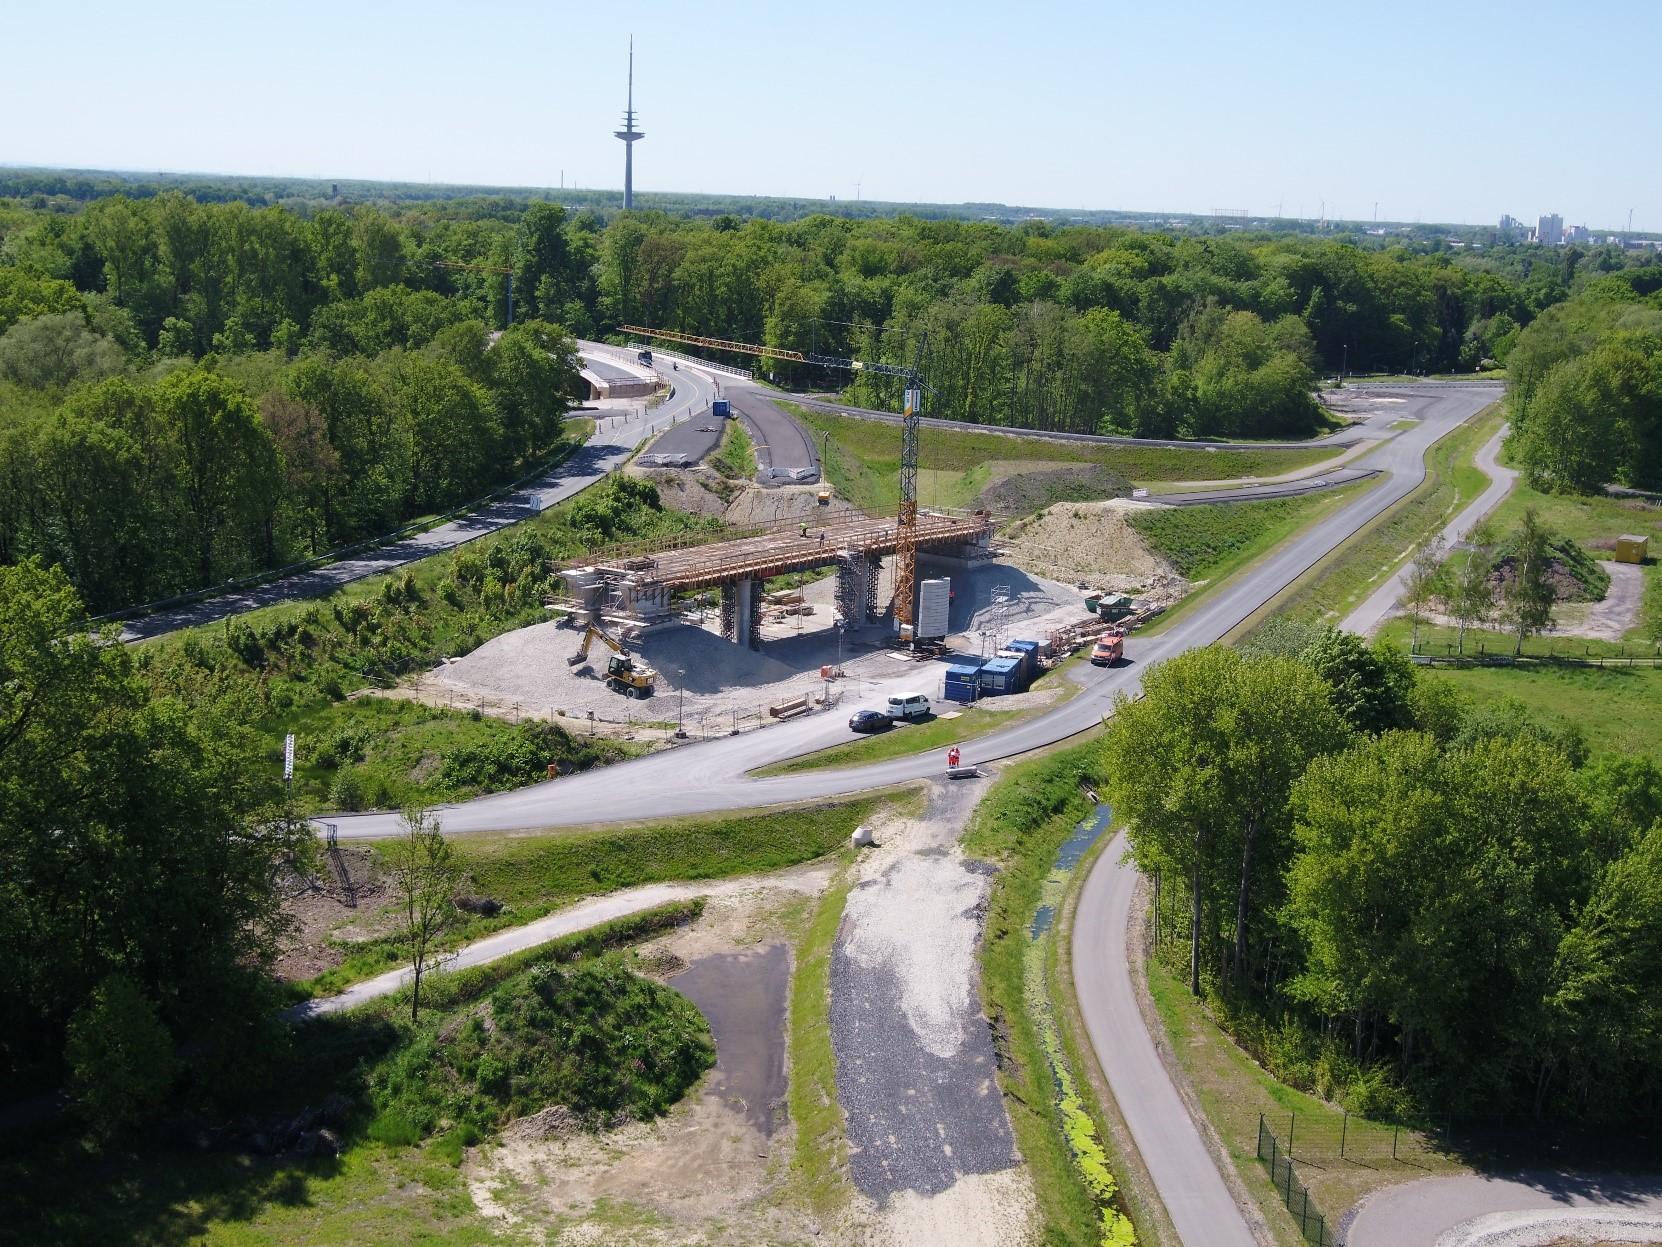 Bau der Umgehungsstraße B 51